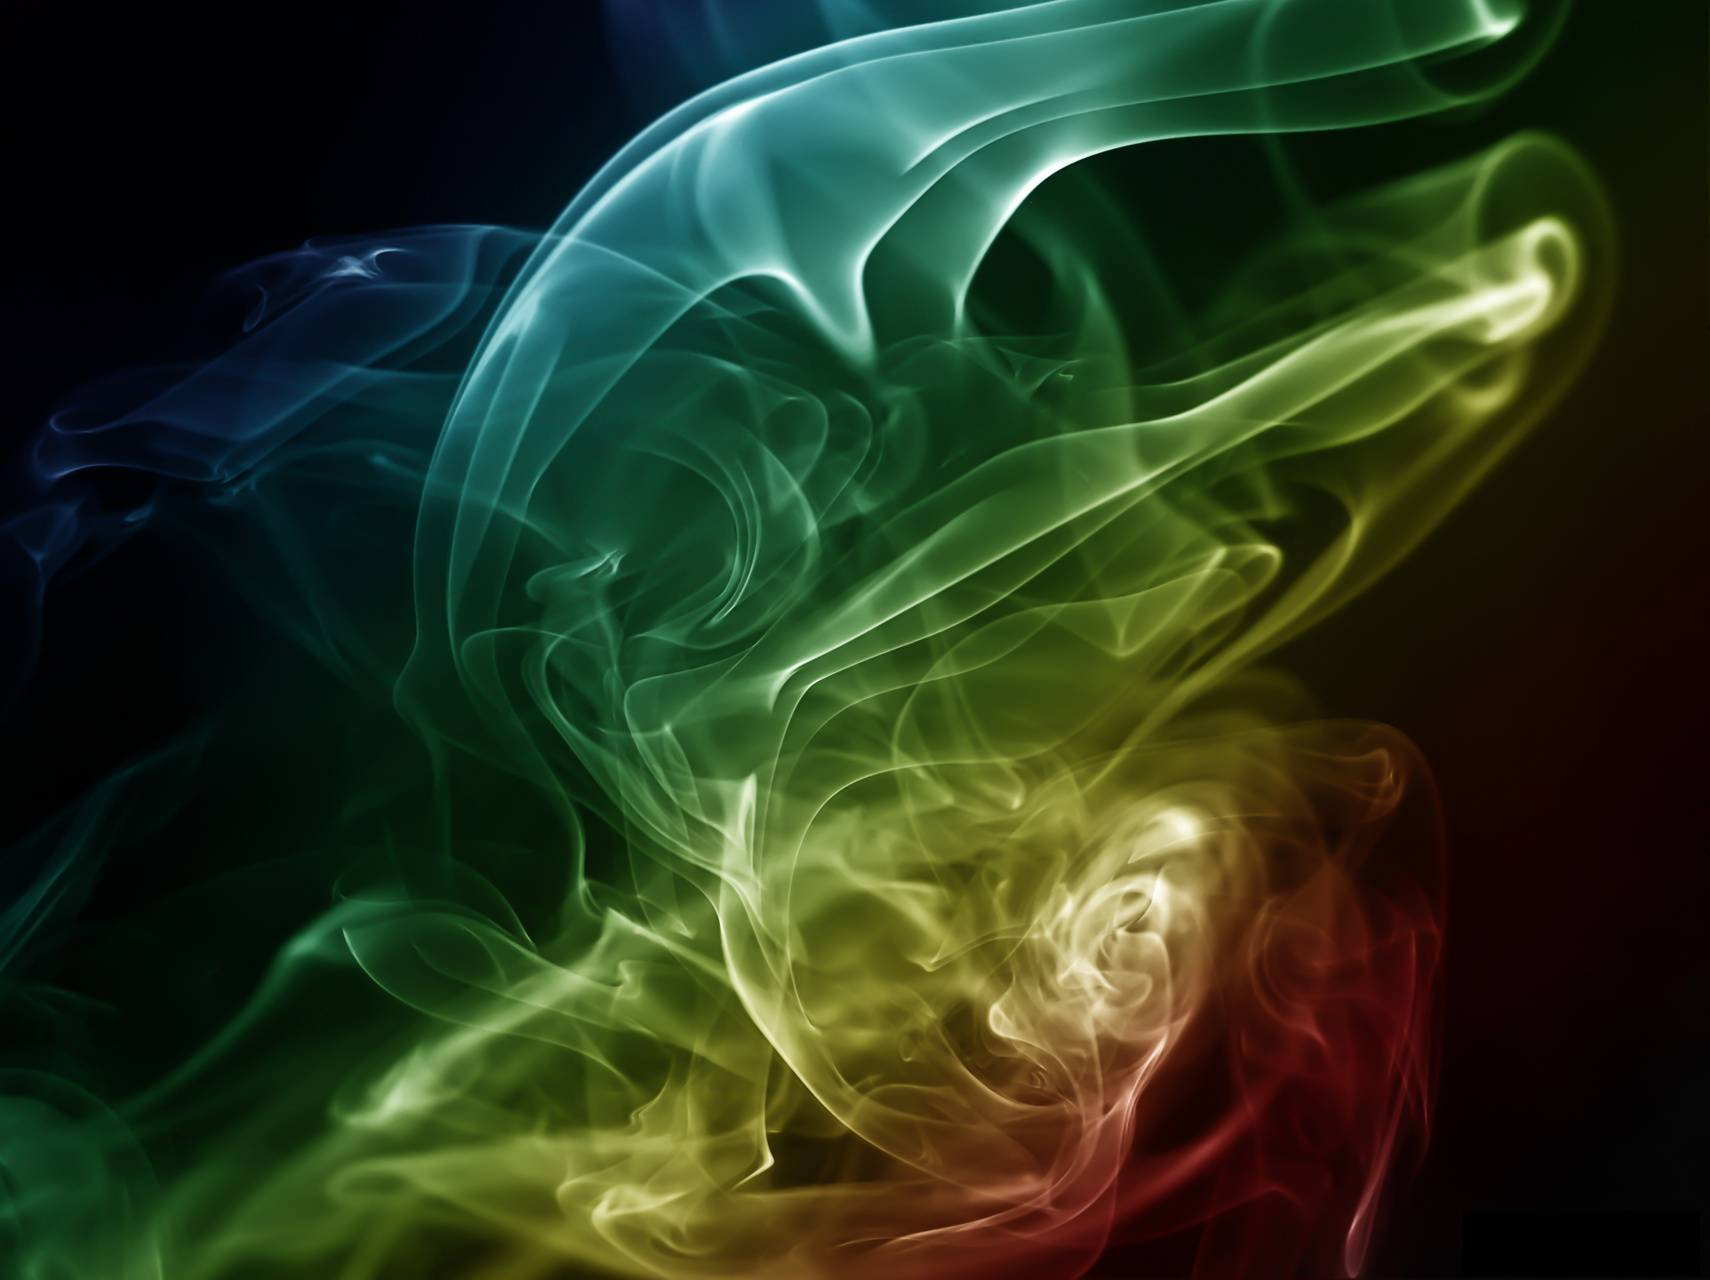 Digital Colore